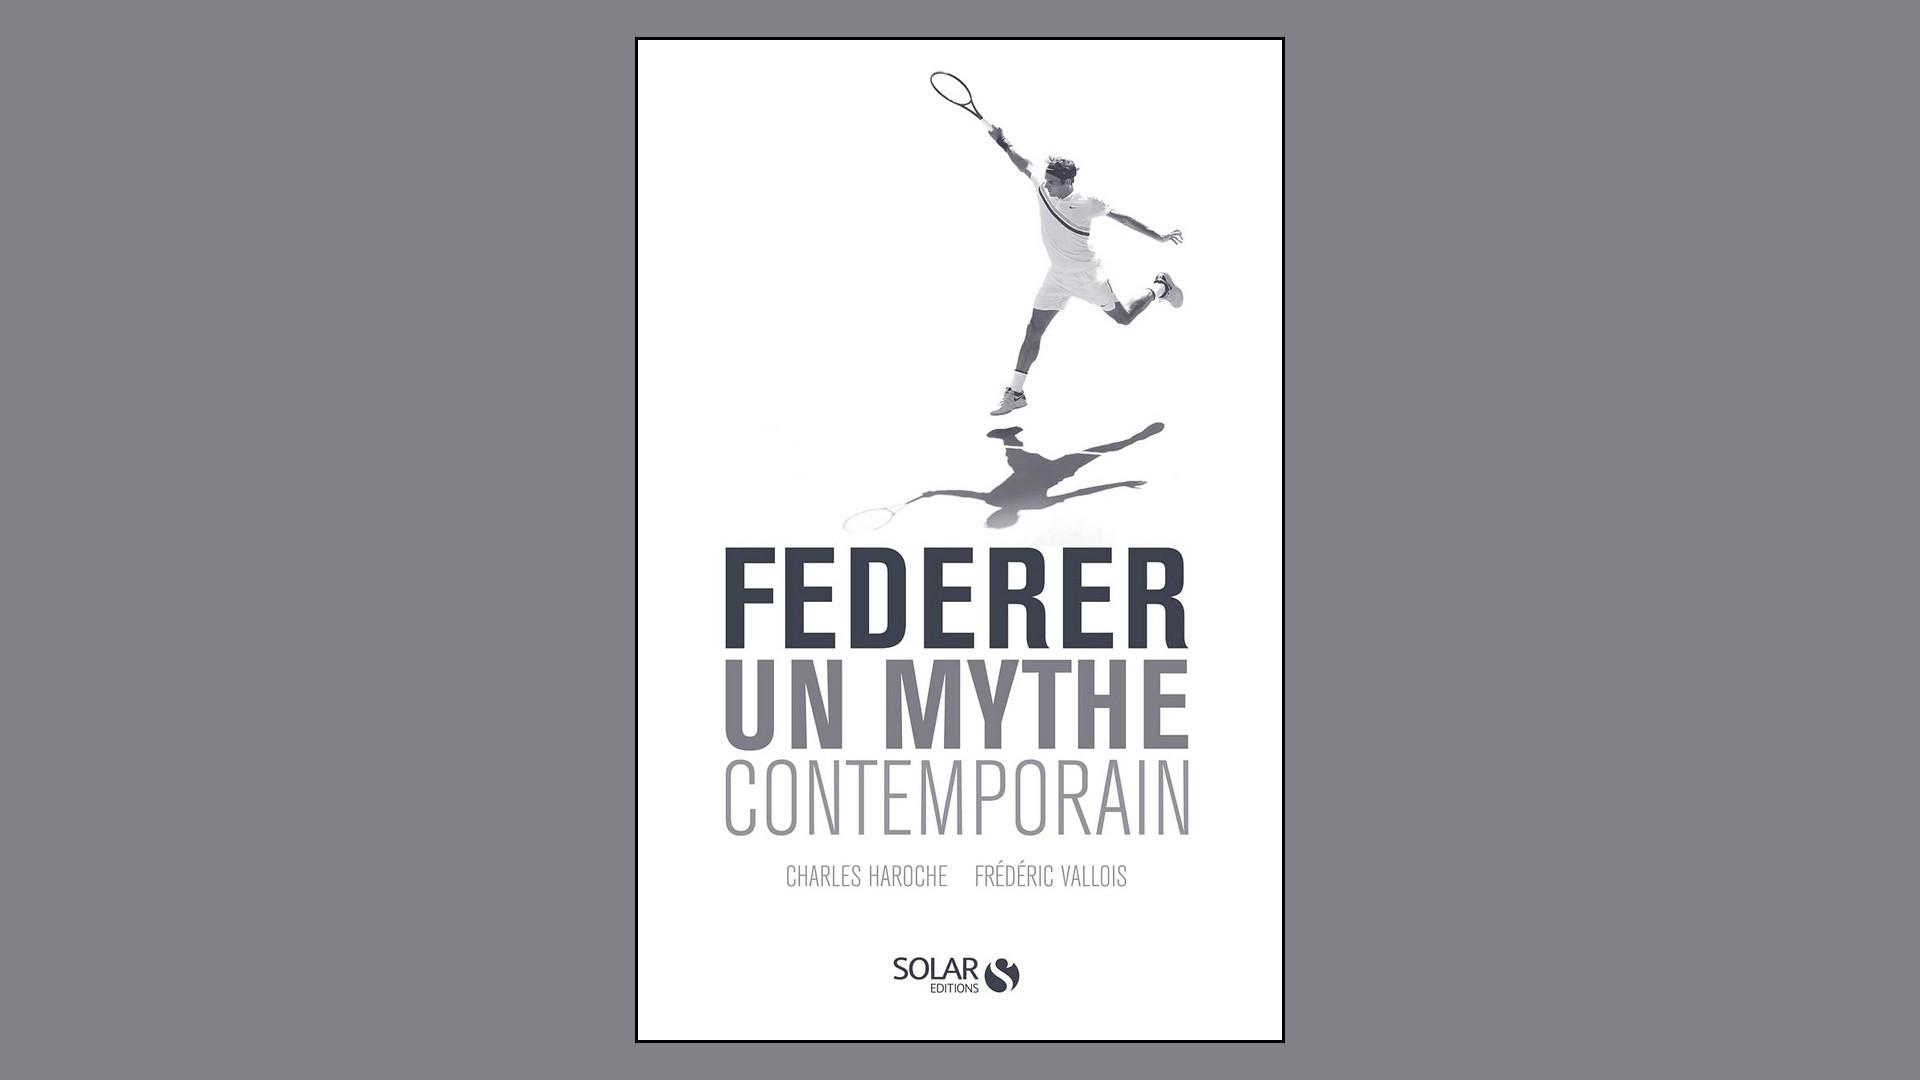 Livres -Federer un mythe contemporain – Charles Laroche Frédérioc Vallois